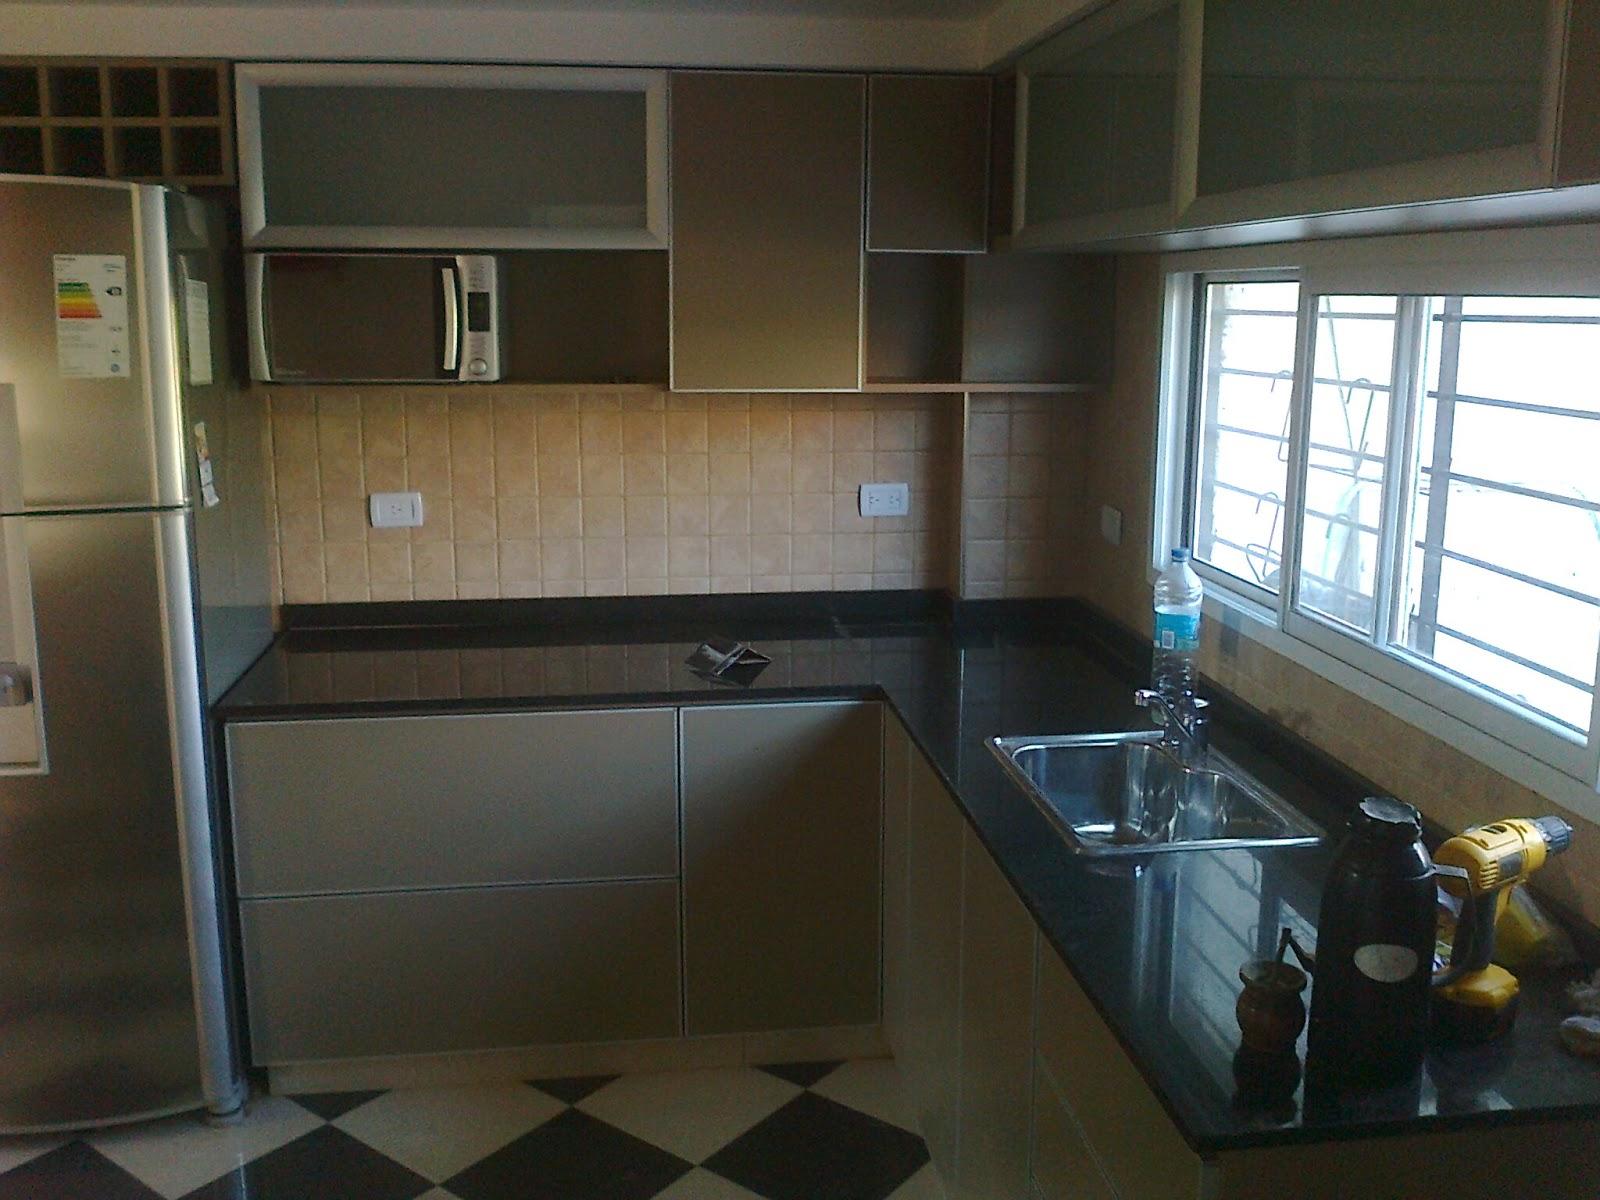 Muebles de cocina de cedro usados 20170726005249 for Muebles de melamina